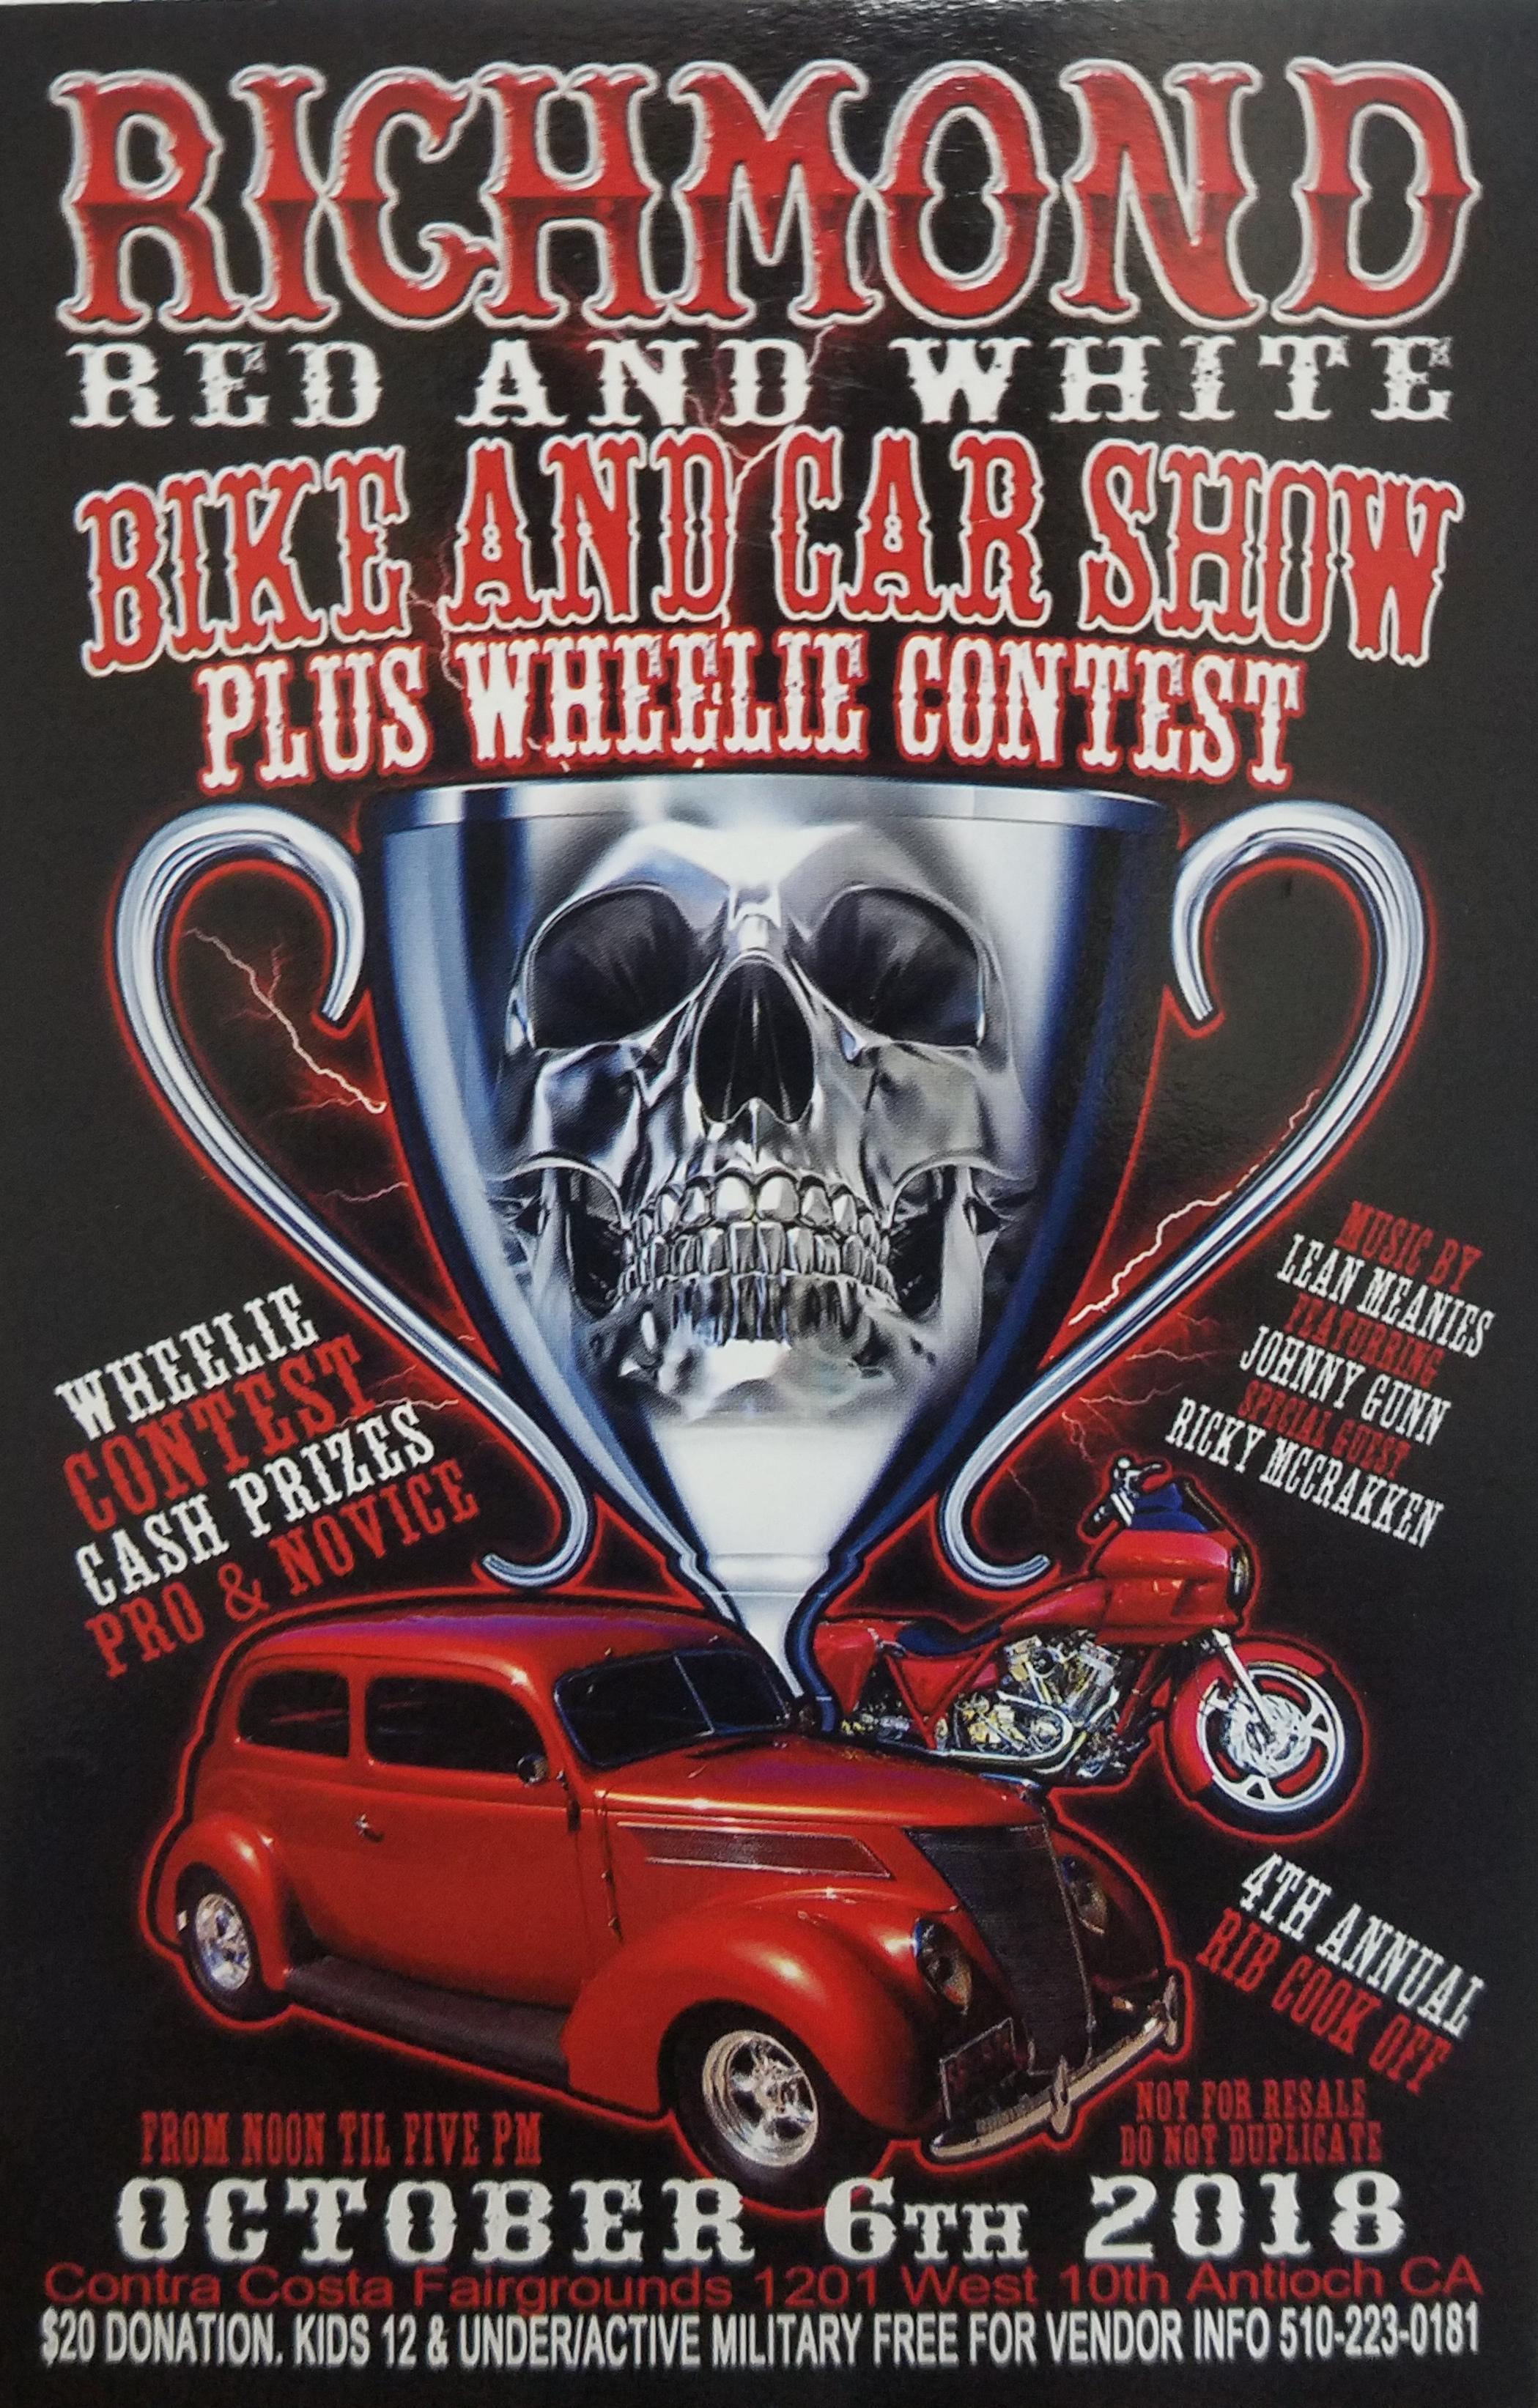 RICHMOND RED AND WHITEBIKE AND CAR SHOW PLUS WHEELIE CONTEST - Antioch ca car show 2018